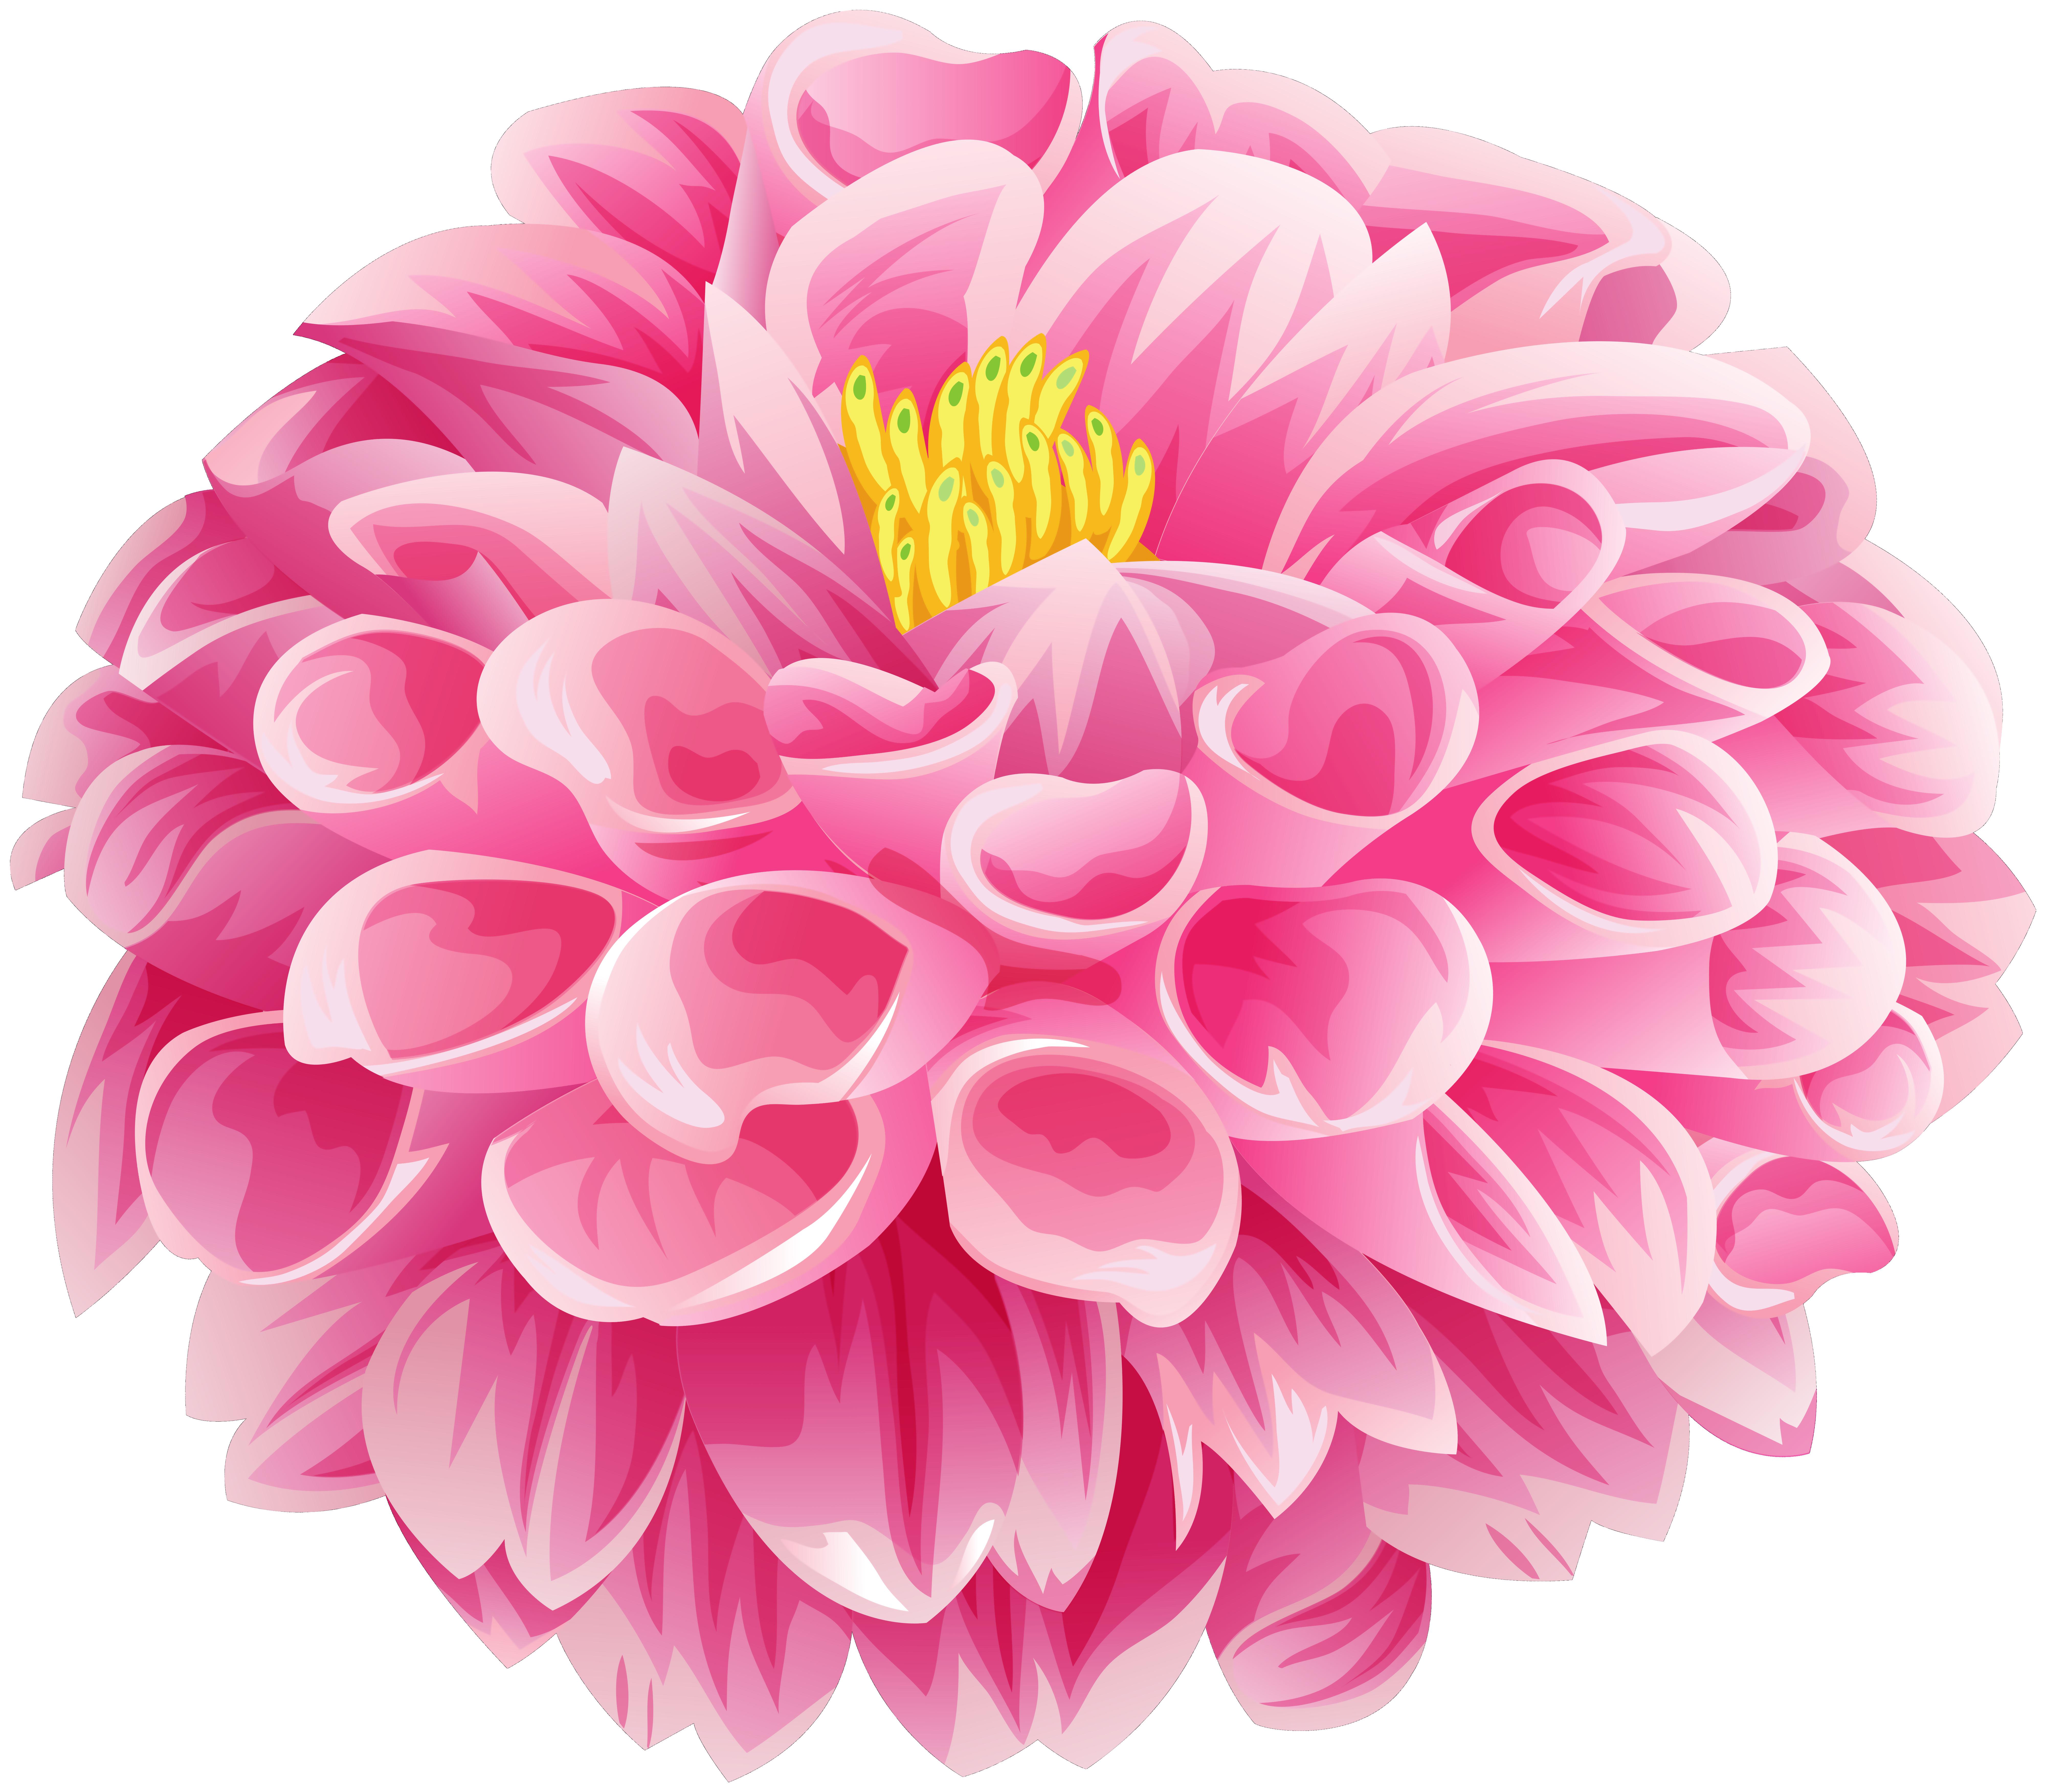 Pink Dahlia Flower Clip Art Image.